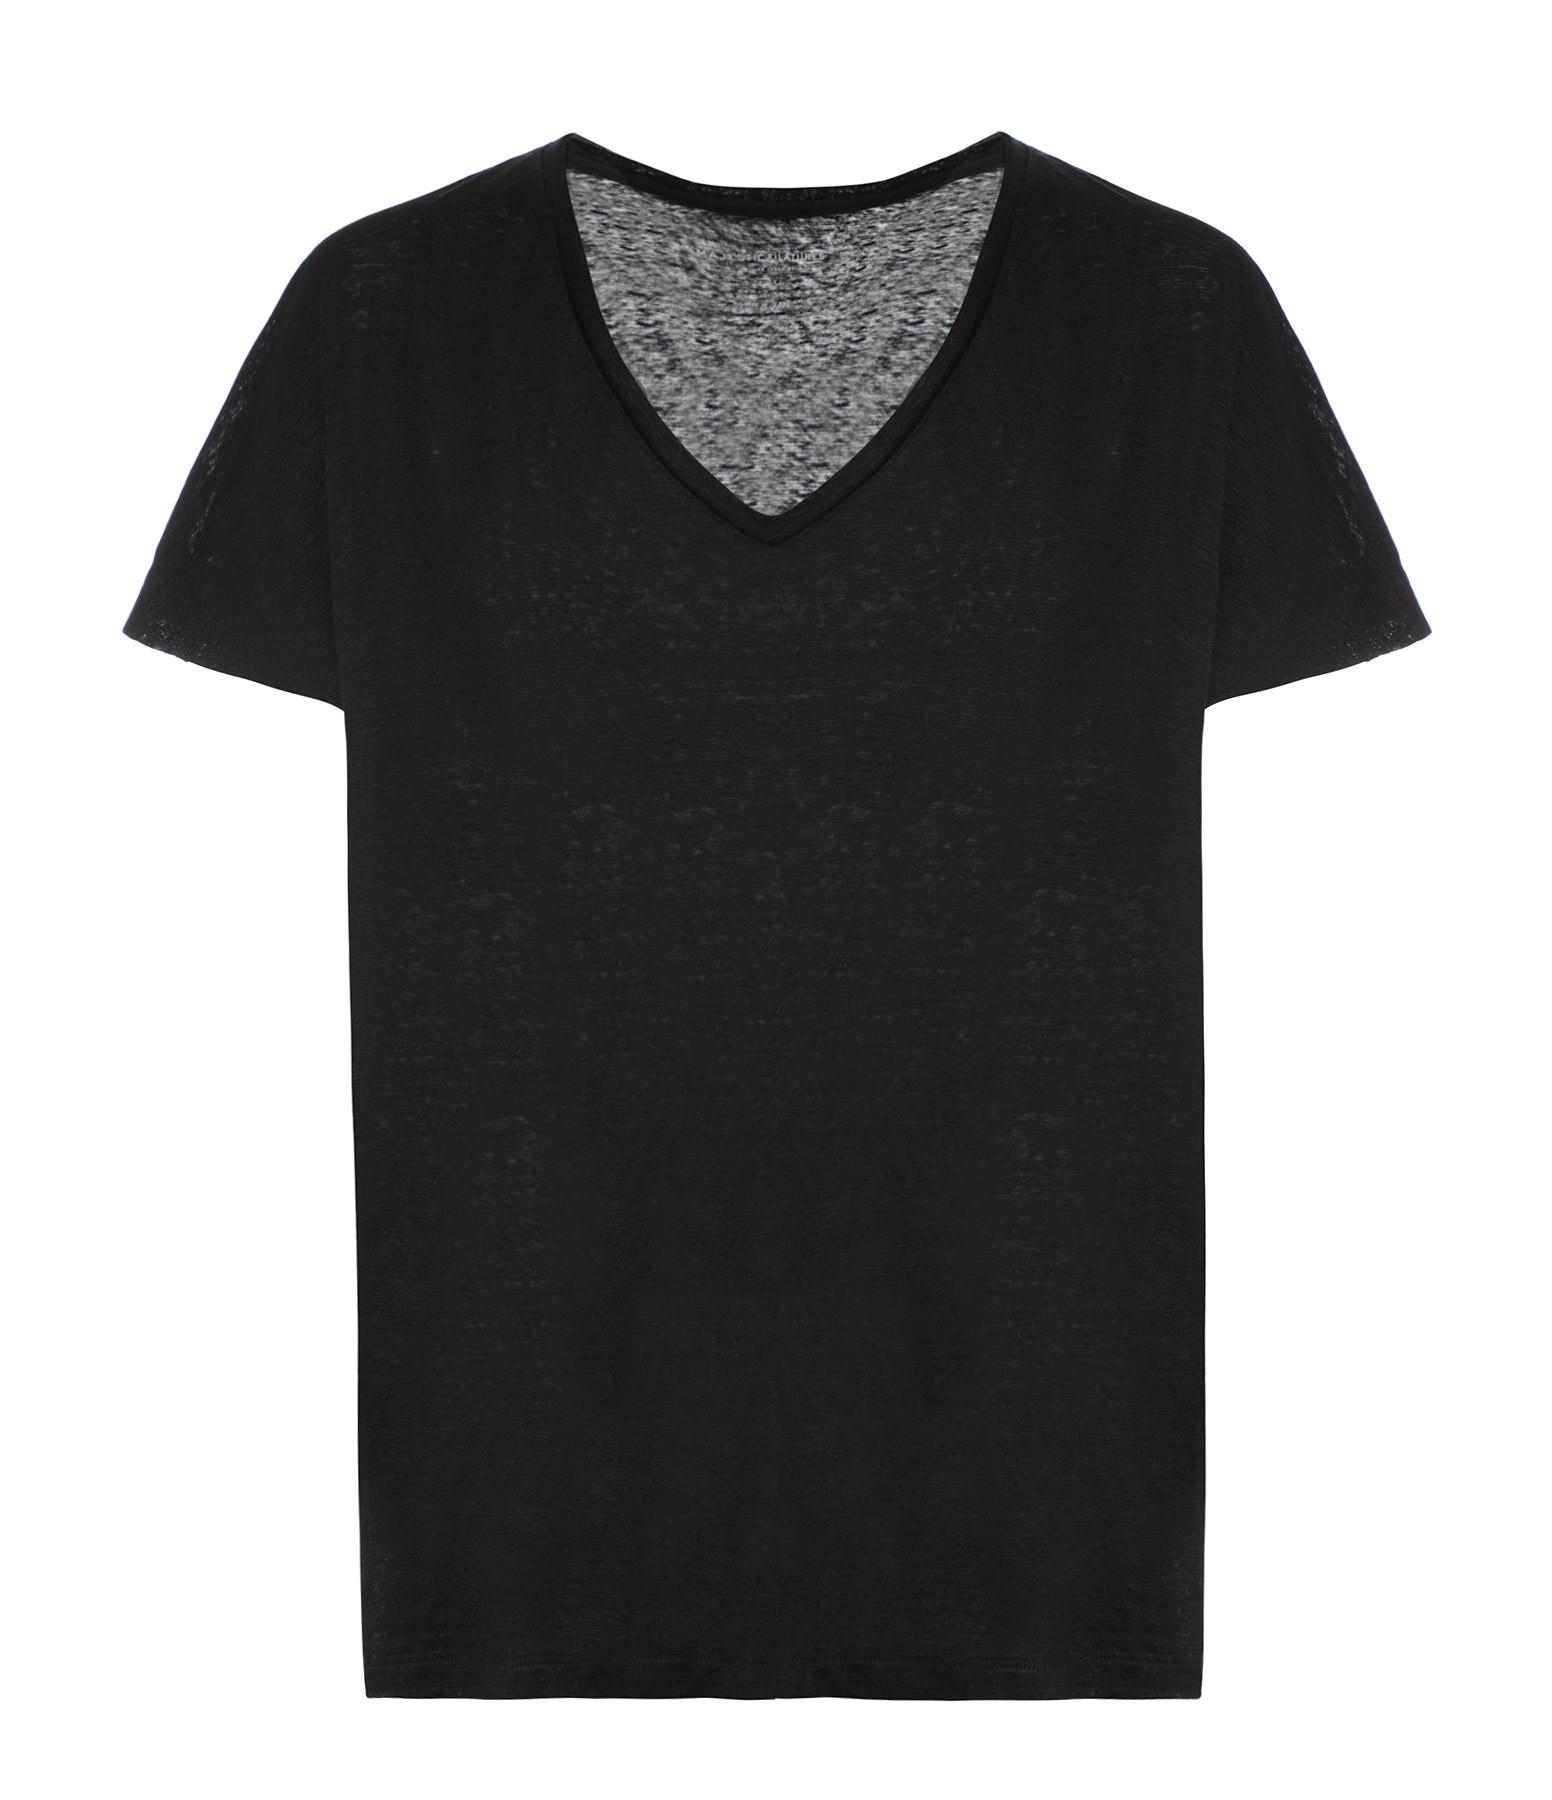 MAJESTIC FILATURES - Tee-shirt Loose Col V Lin Noir